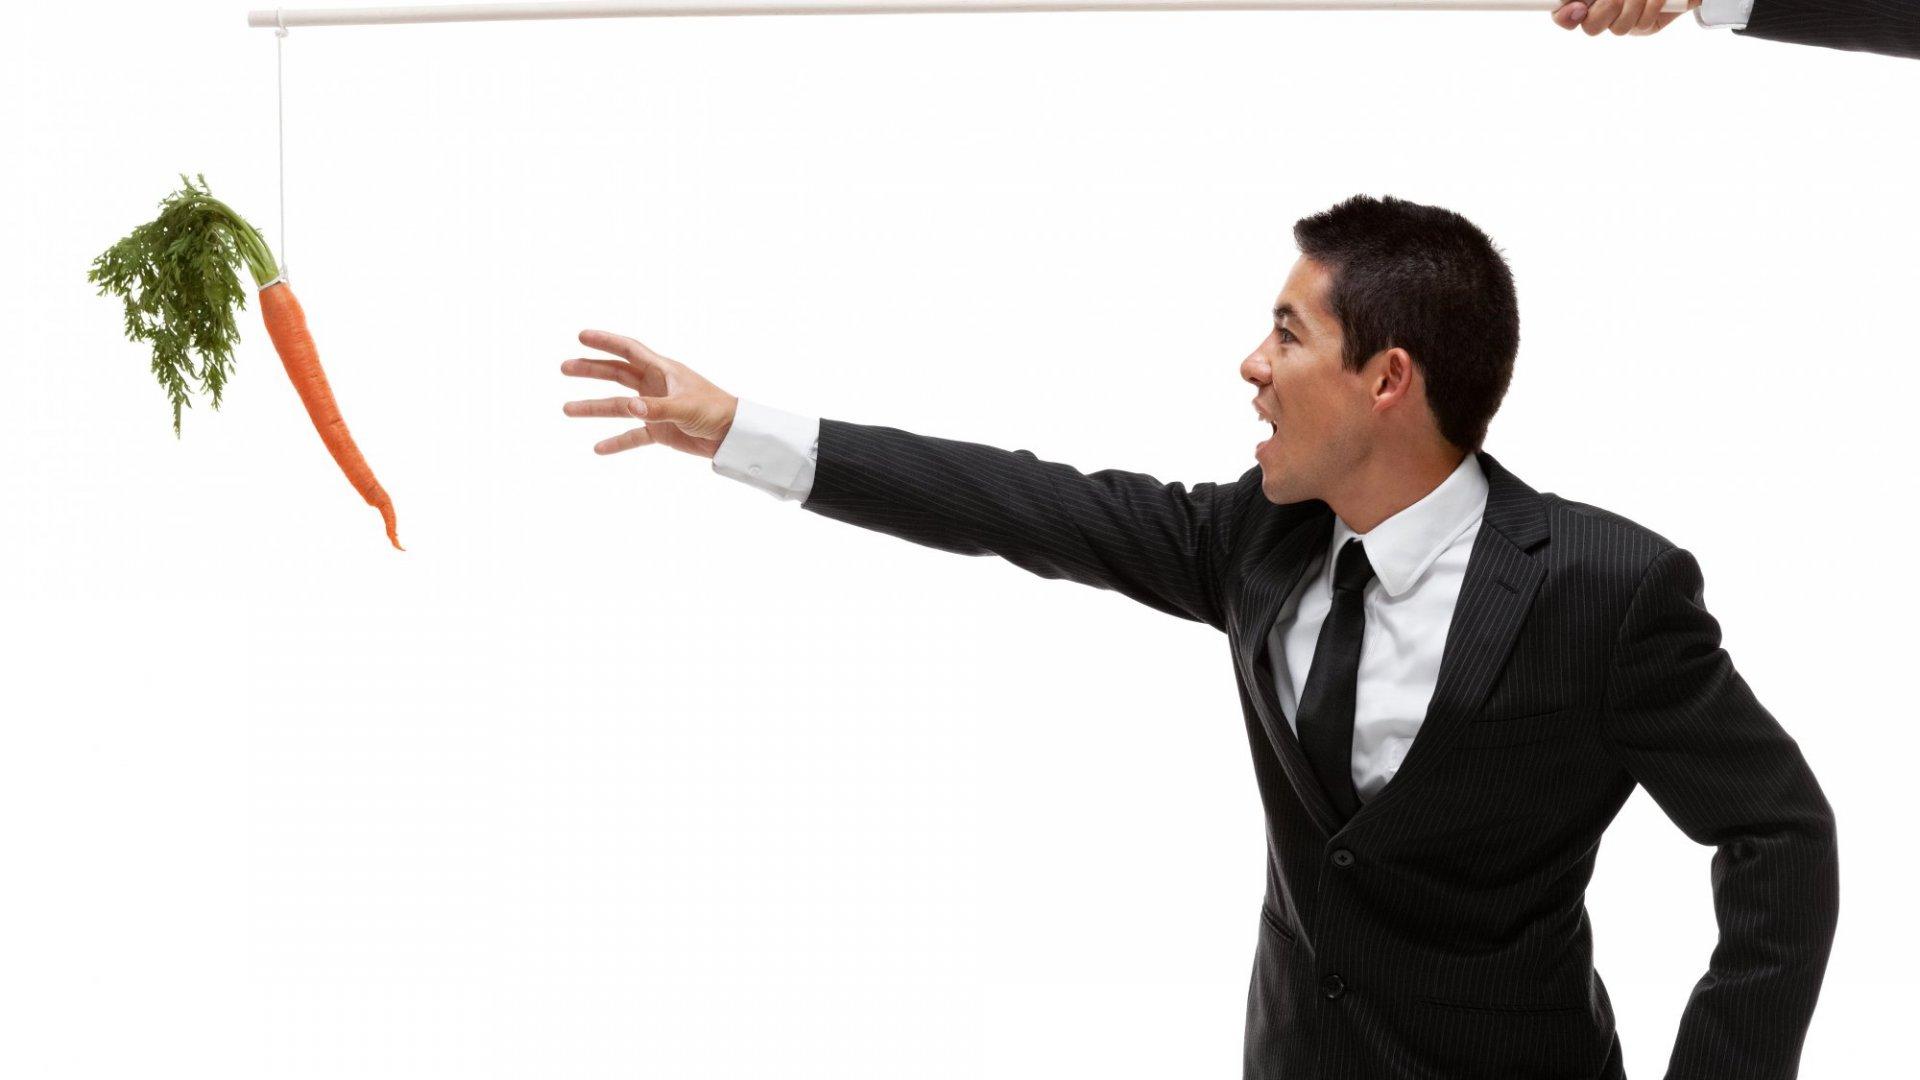 Two Psychology Tricks to Make Good Habits Stick